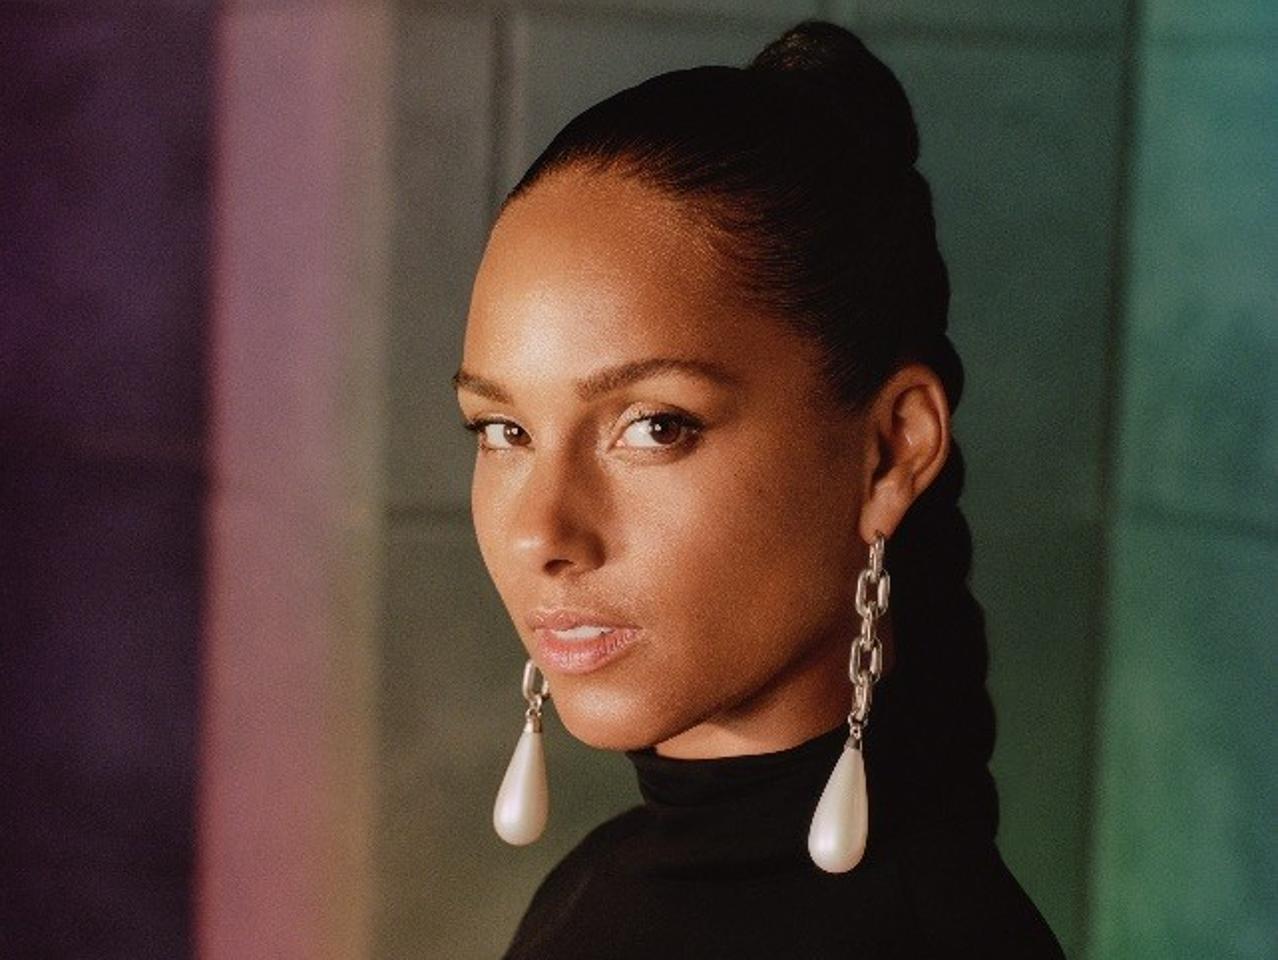 Accordi Alicia Keys